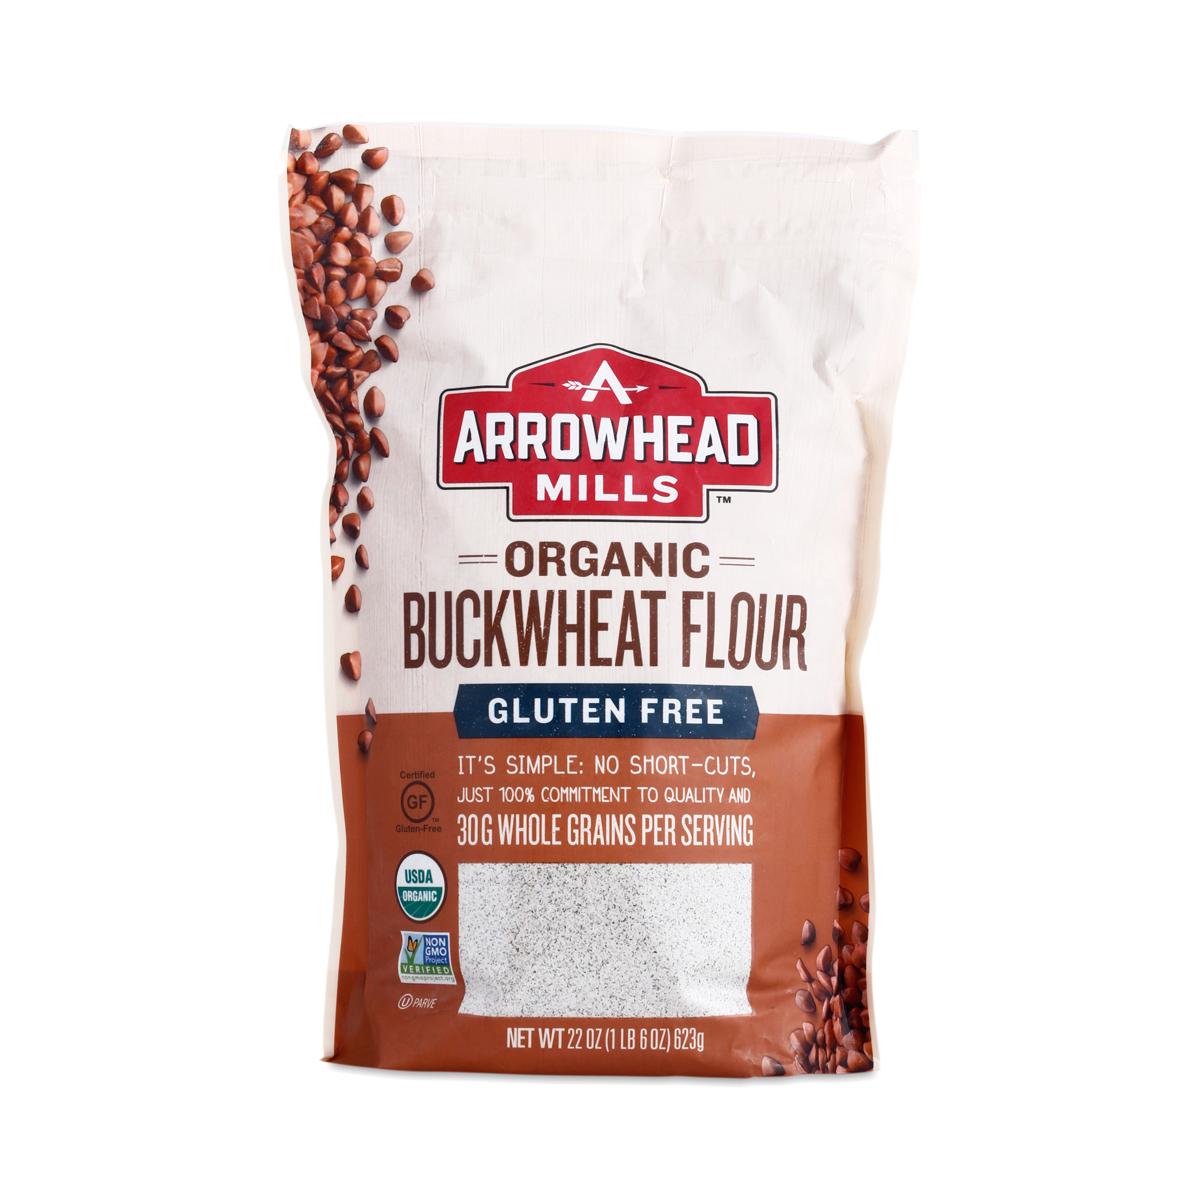 Gluten Free & Organic Buckwheat Flour by Arrowhead Mills